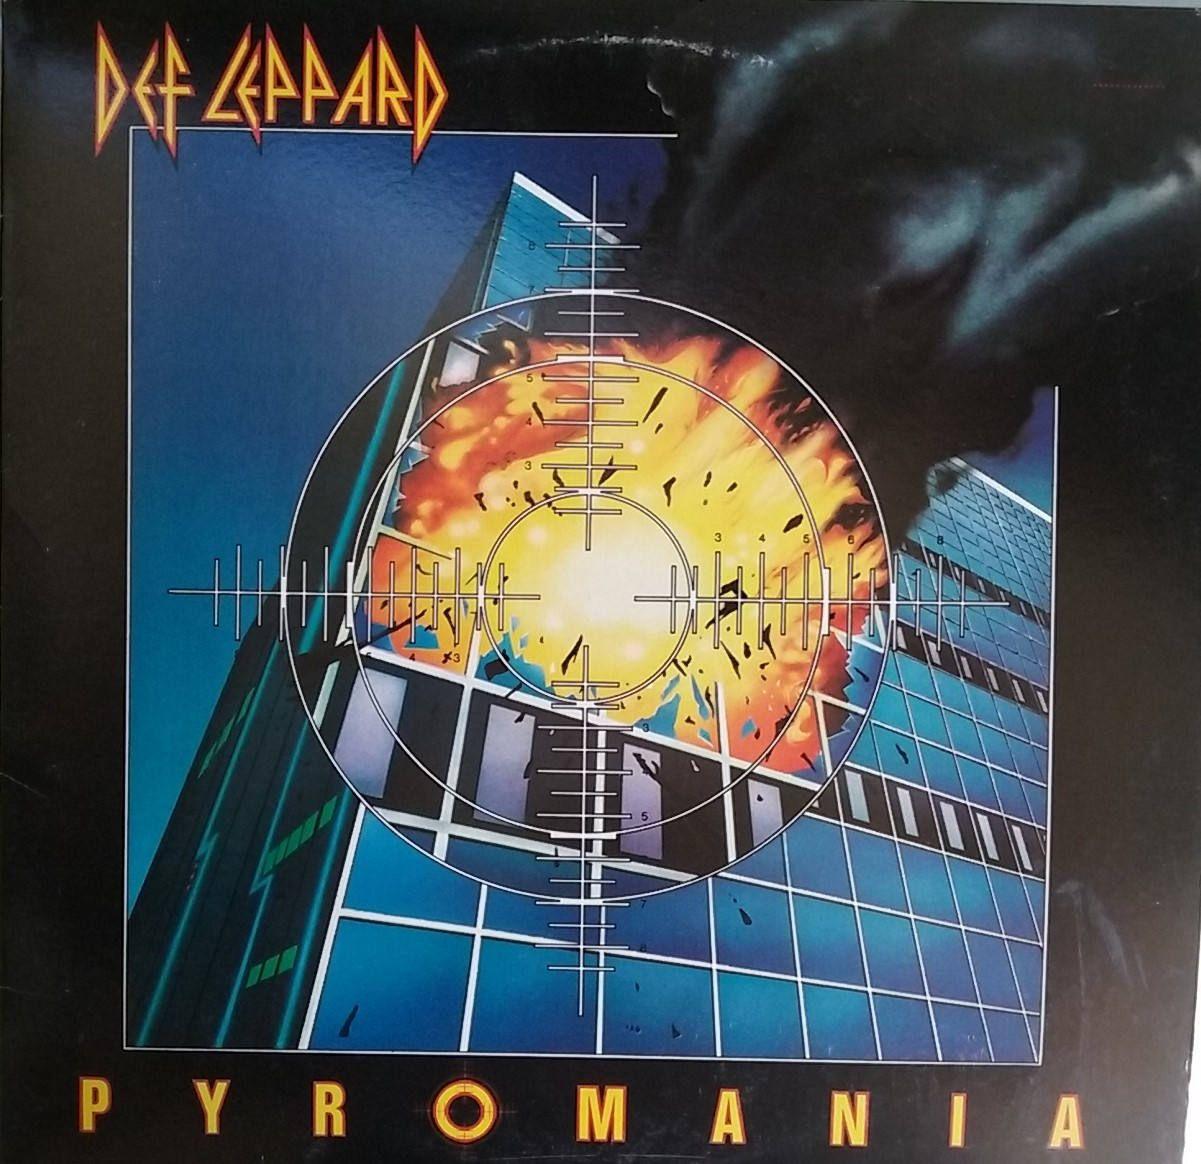 Def Leppard Pyromania Vintage Record Album Vinyl Lp Classic Rock And Roll Music Hard Rock English Def Leppard Def Leppard Pyromania Vintage Vinyl Records